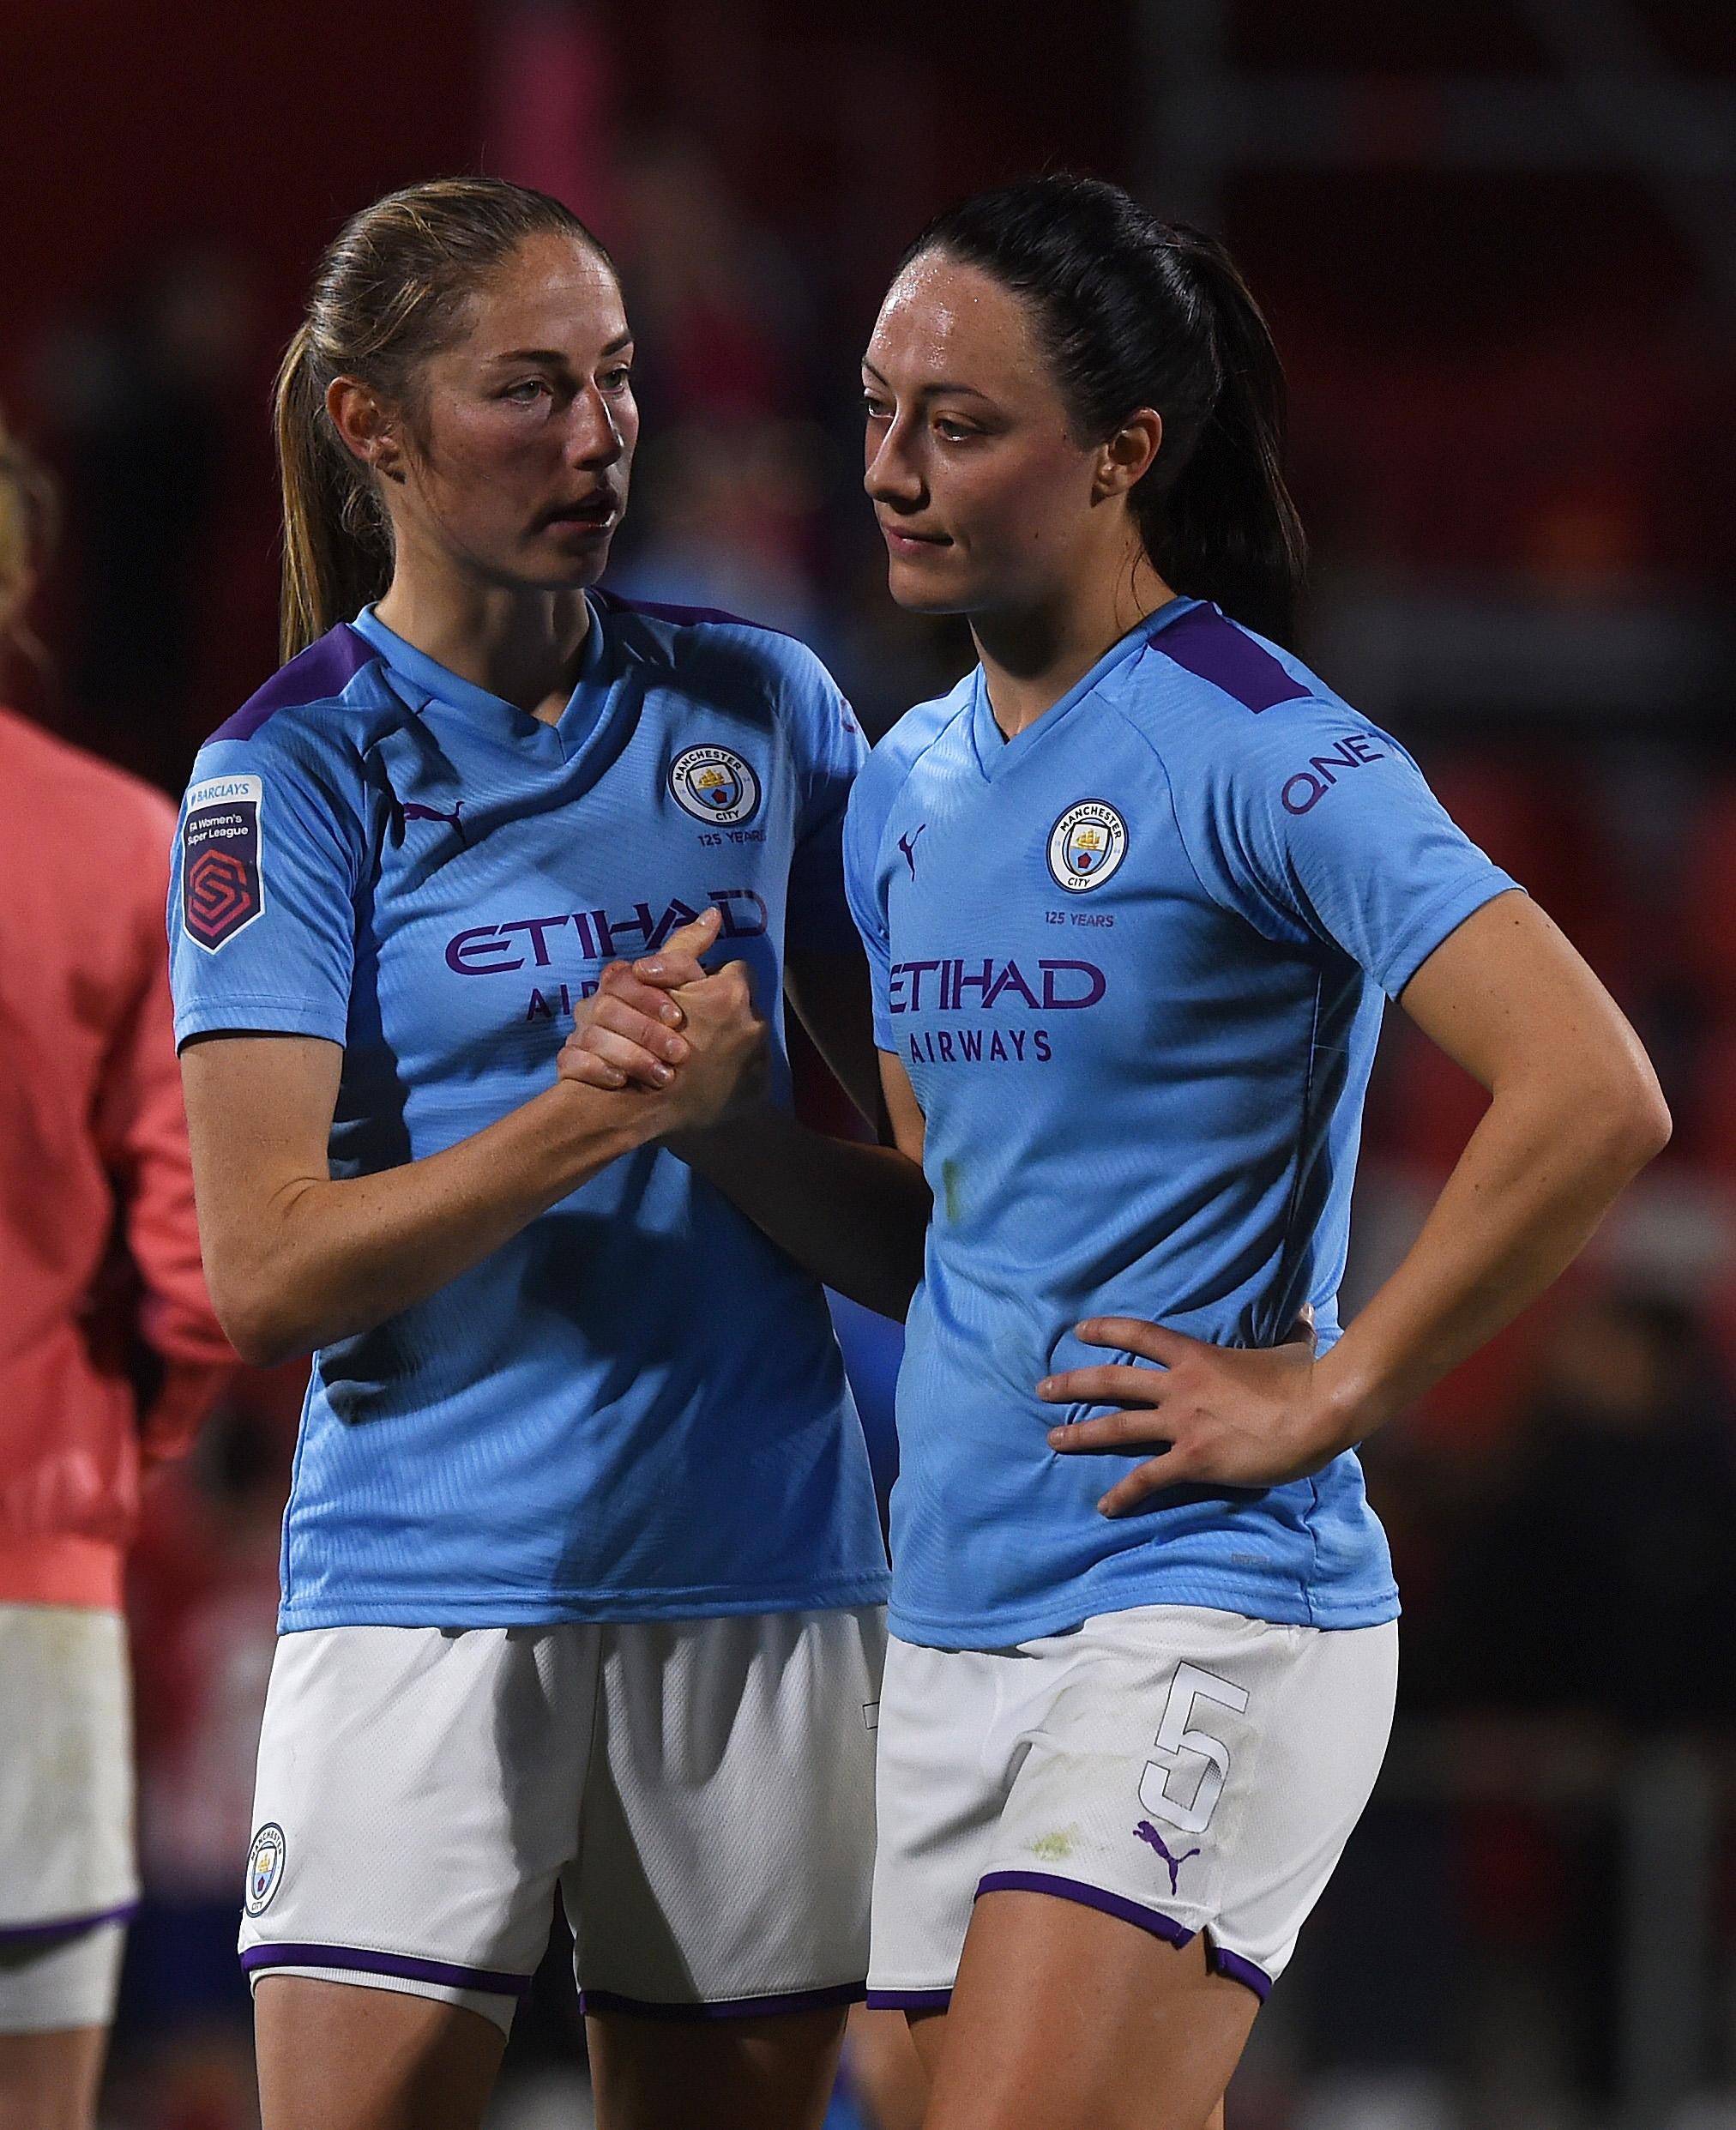 Atletico Madrid Femenino v Manchester City Women - UEFA Women's Champions League Round of 16: Second Leg